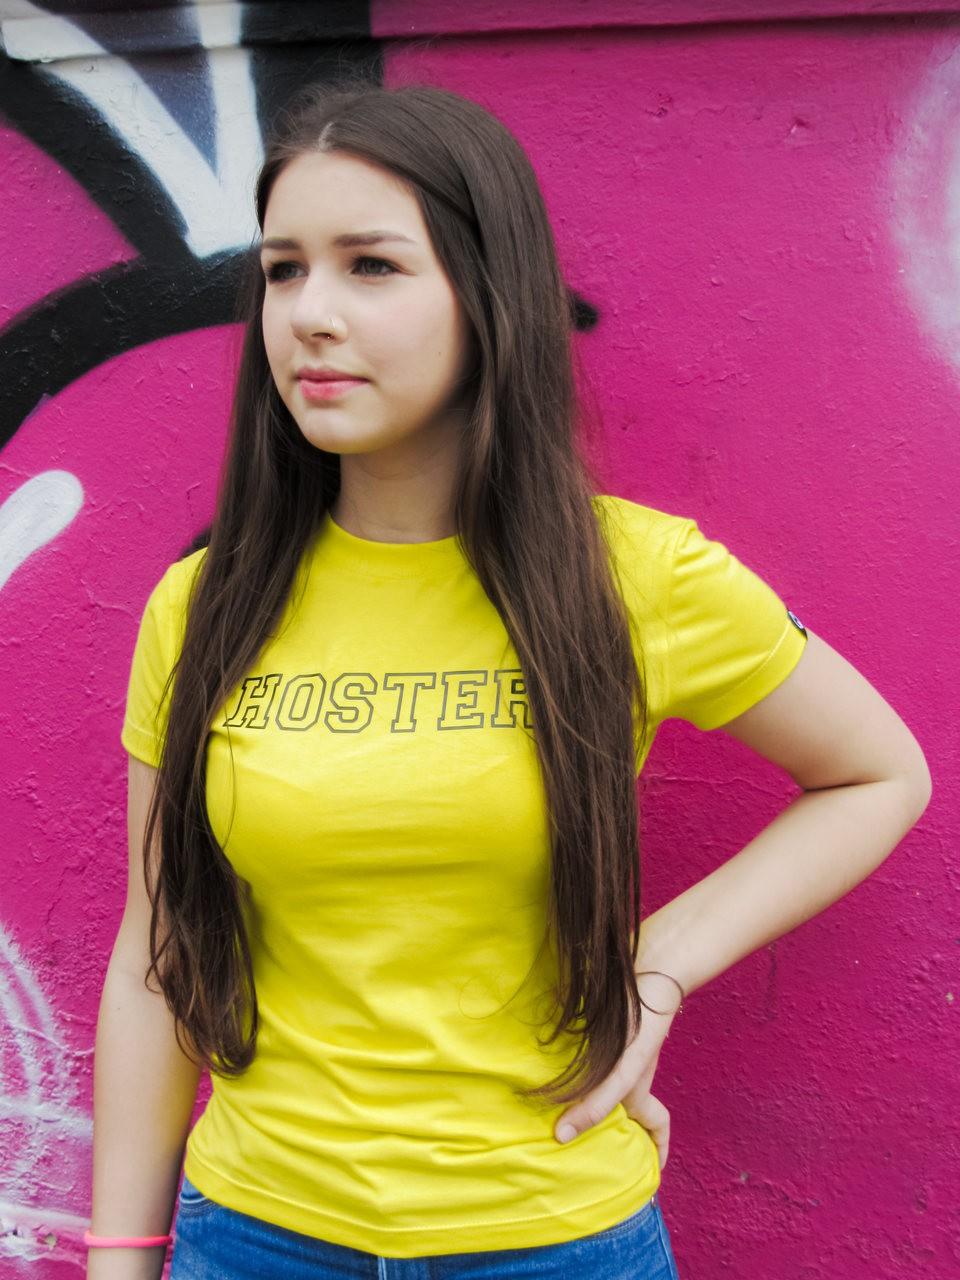 Camiseta Feminina Baby Look HOSTER College Amarela